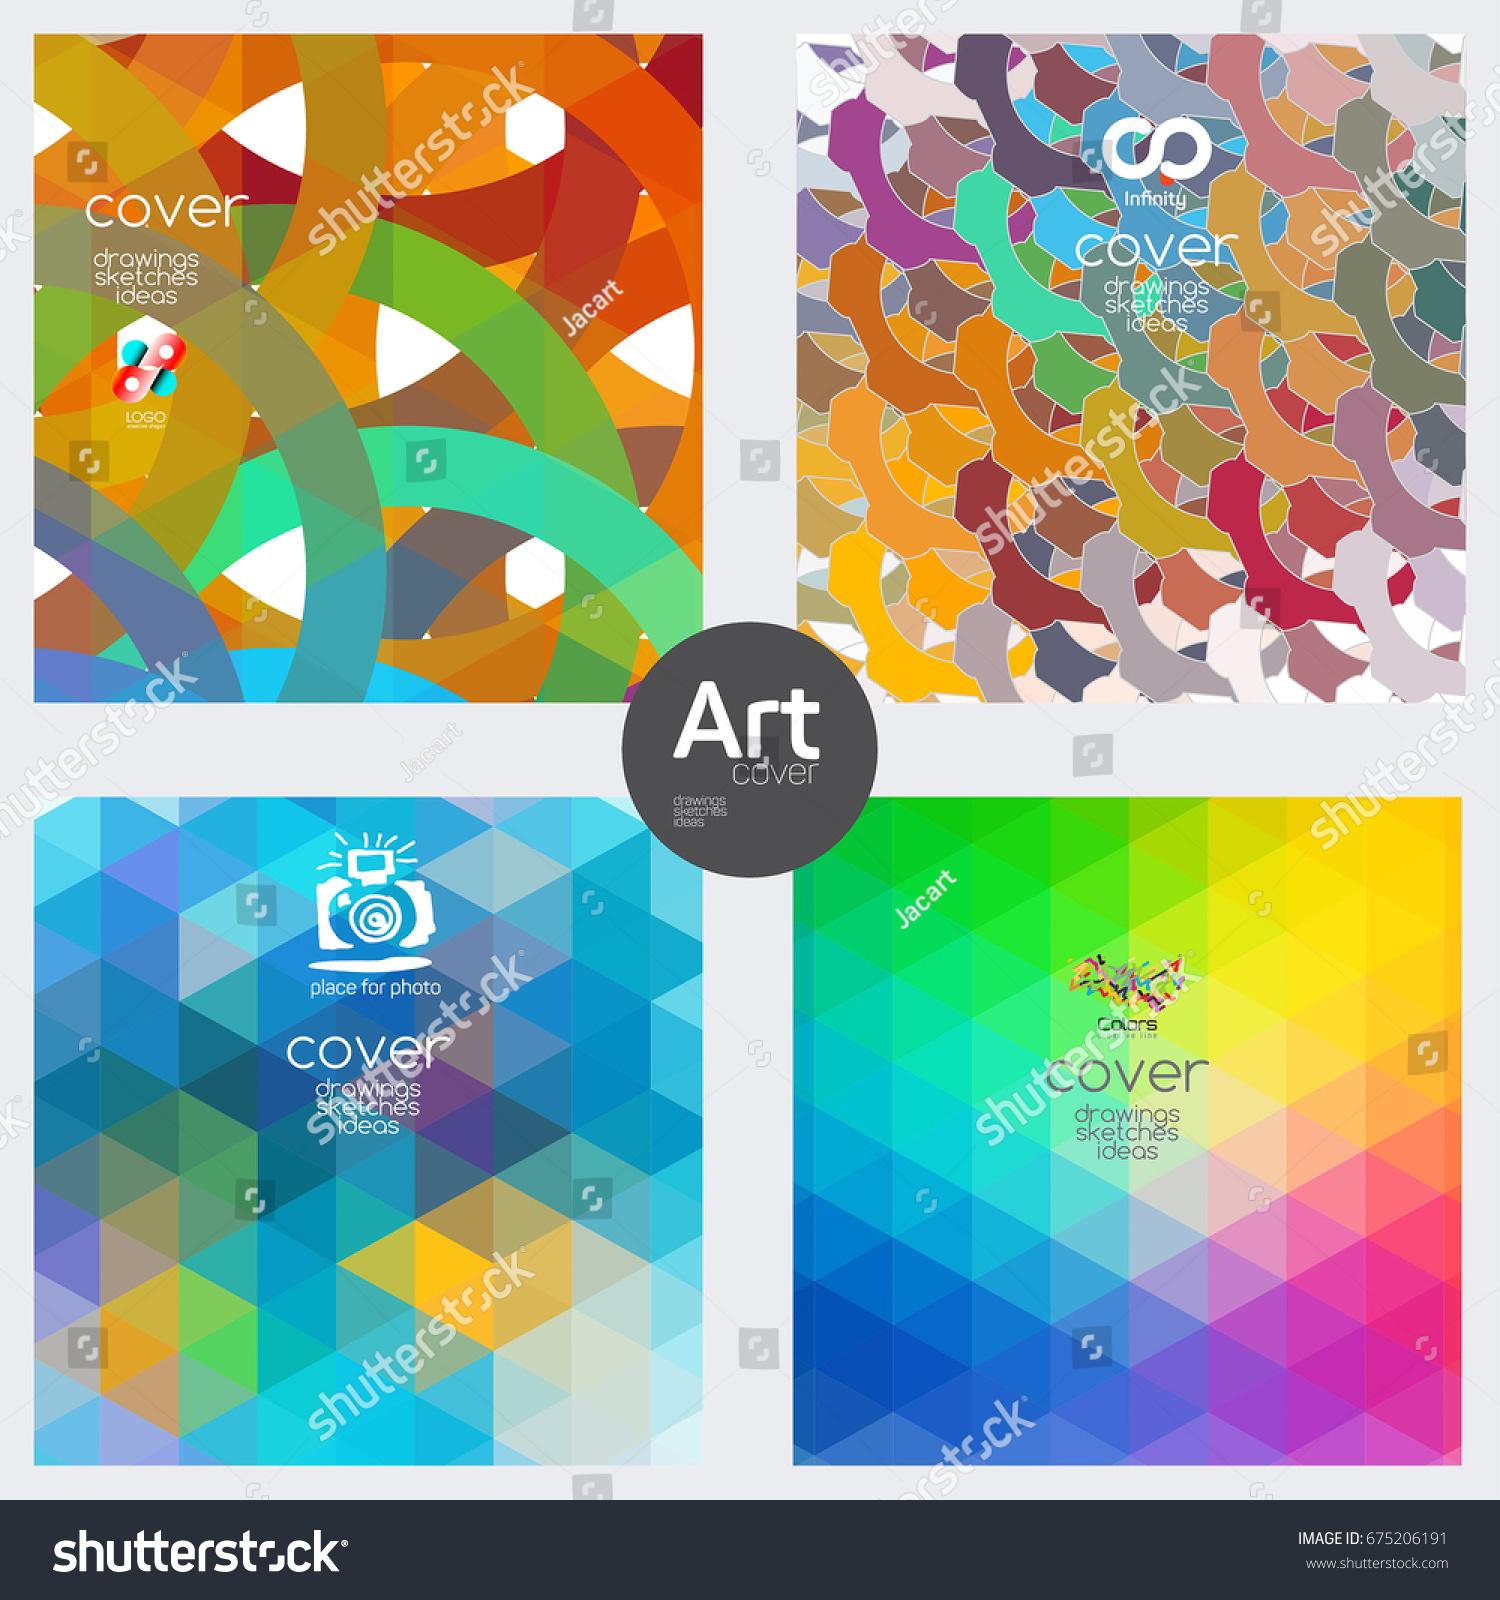 Minimal Covers Design Warm Color Palette Stock Vector 675206191 ...